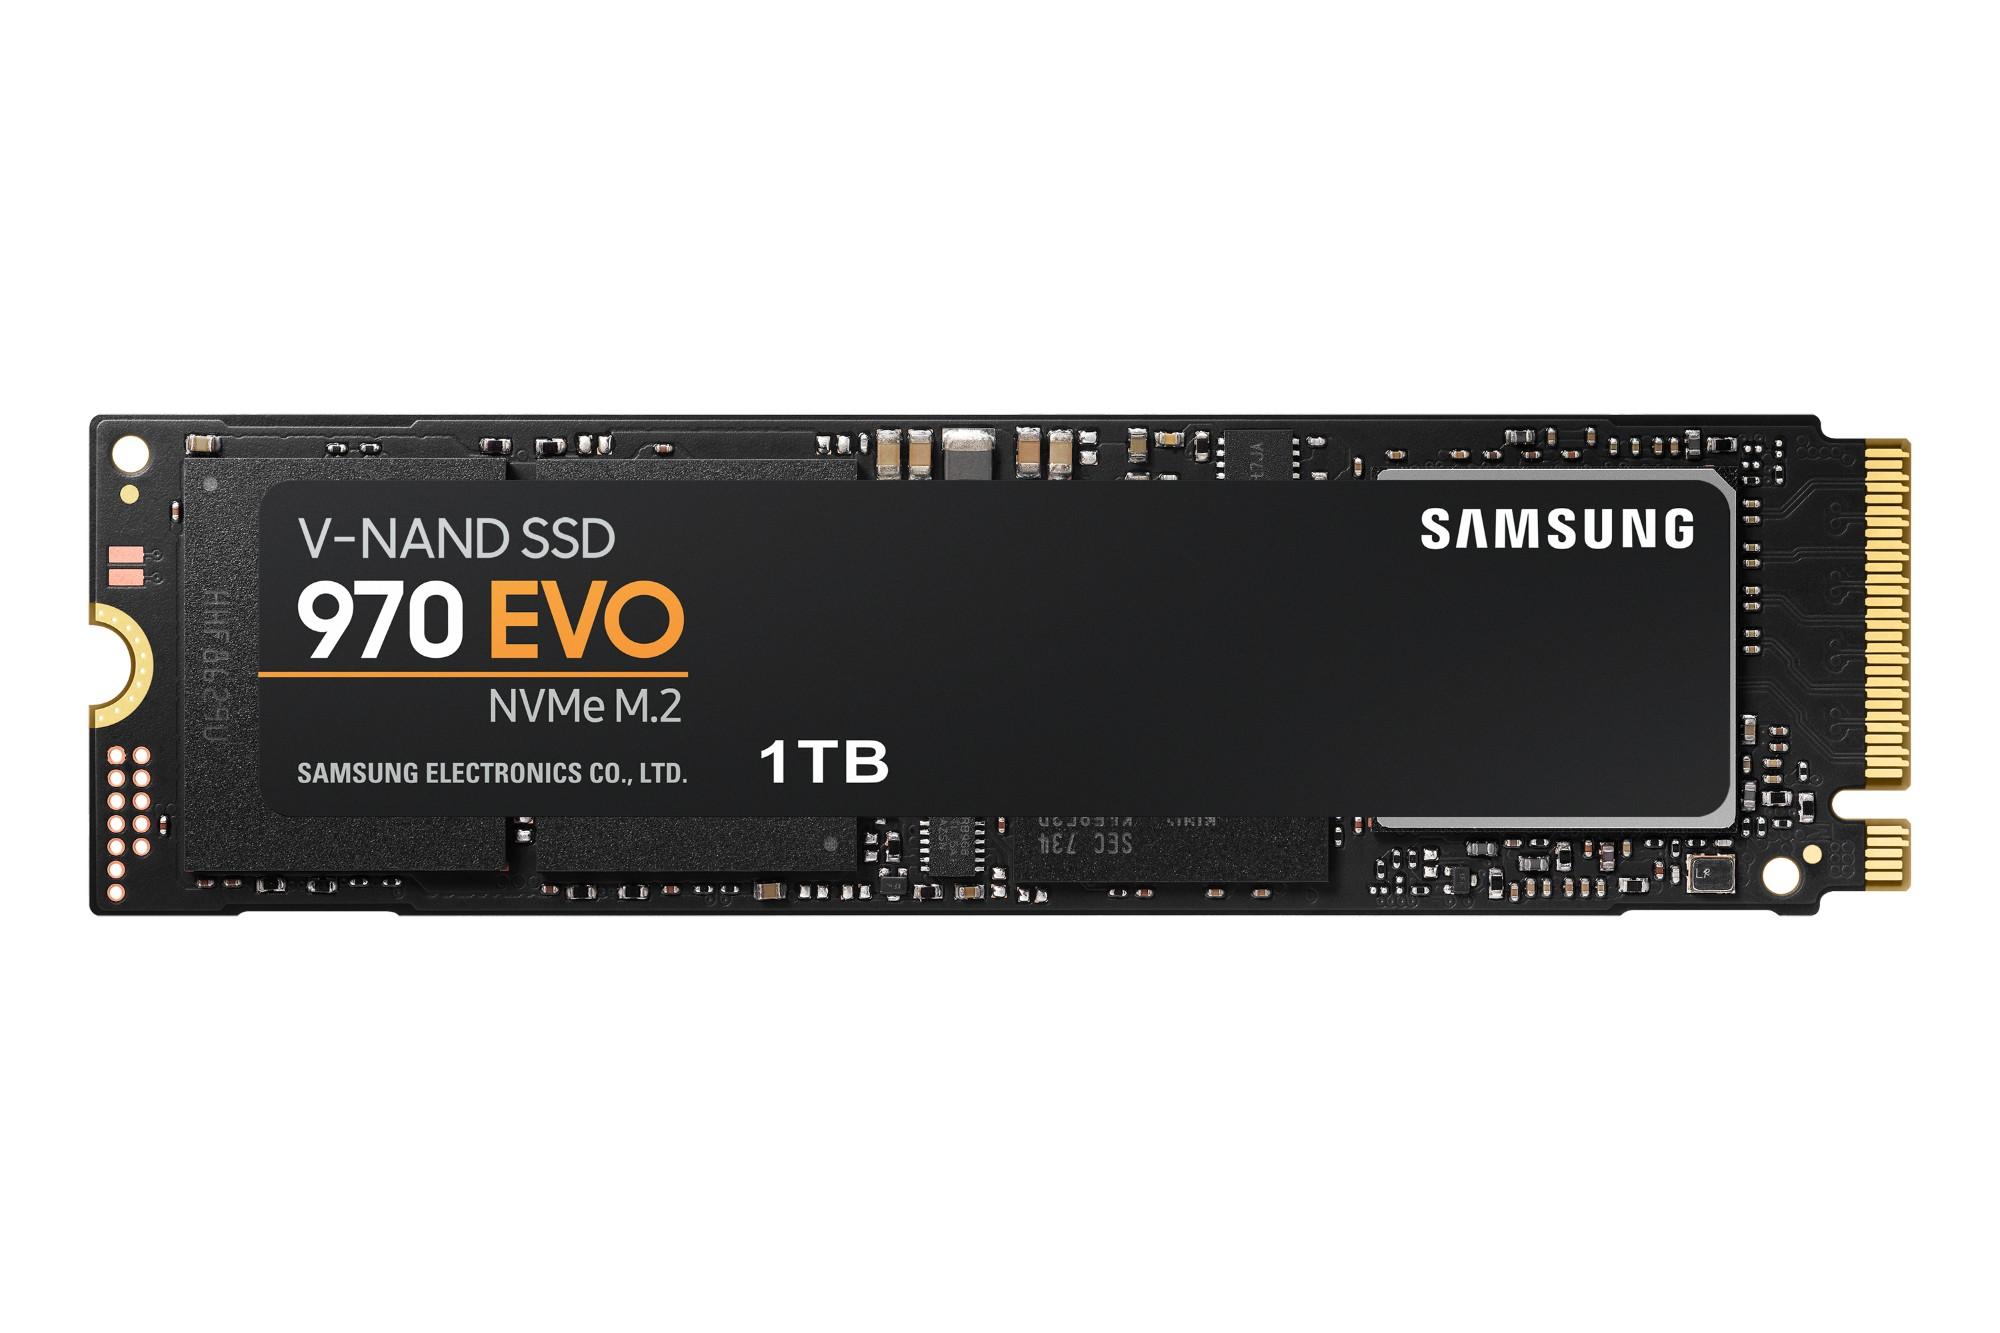 Samsung 970 EVO M.2 1000 GB PCI Express 3.0 V-NAND MLC NVMe